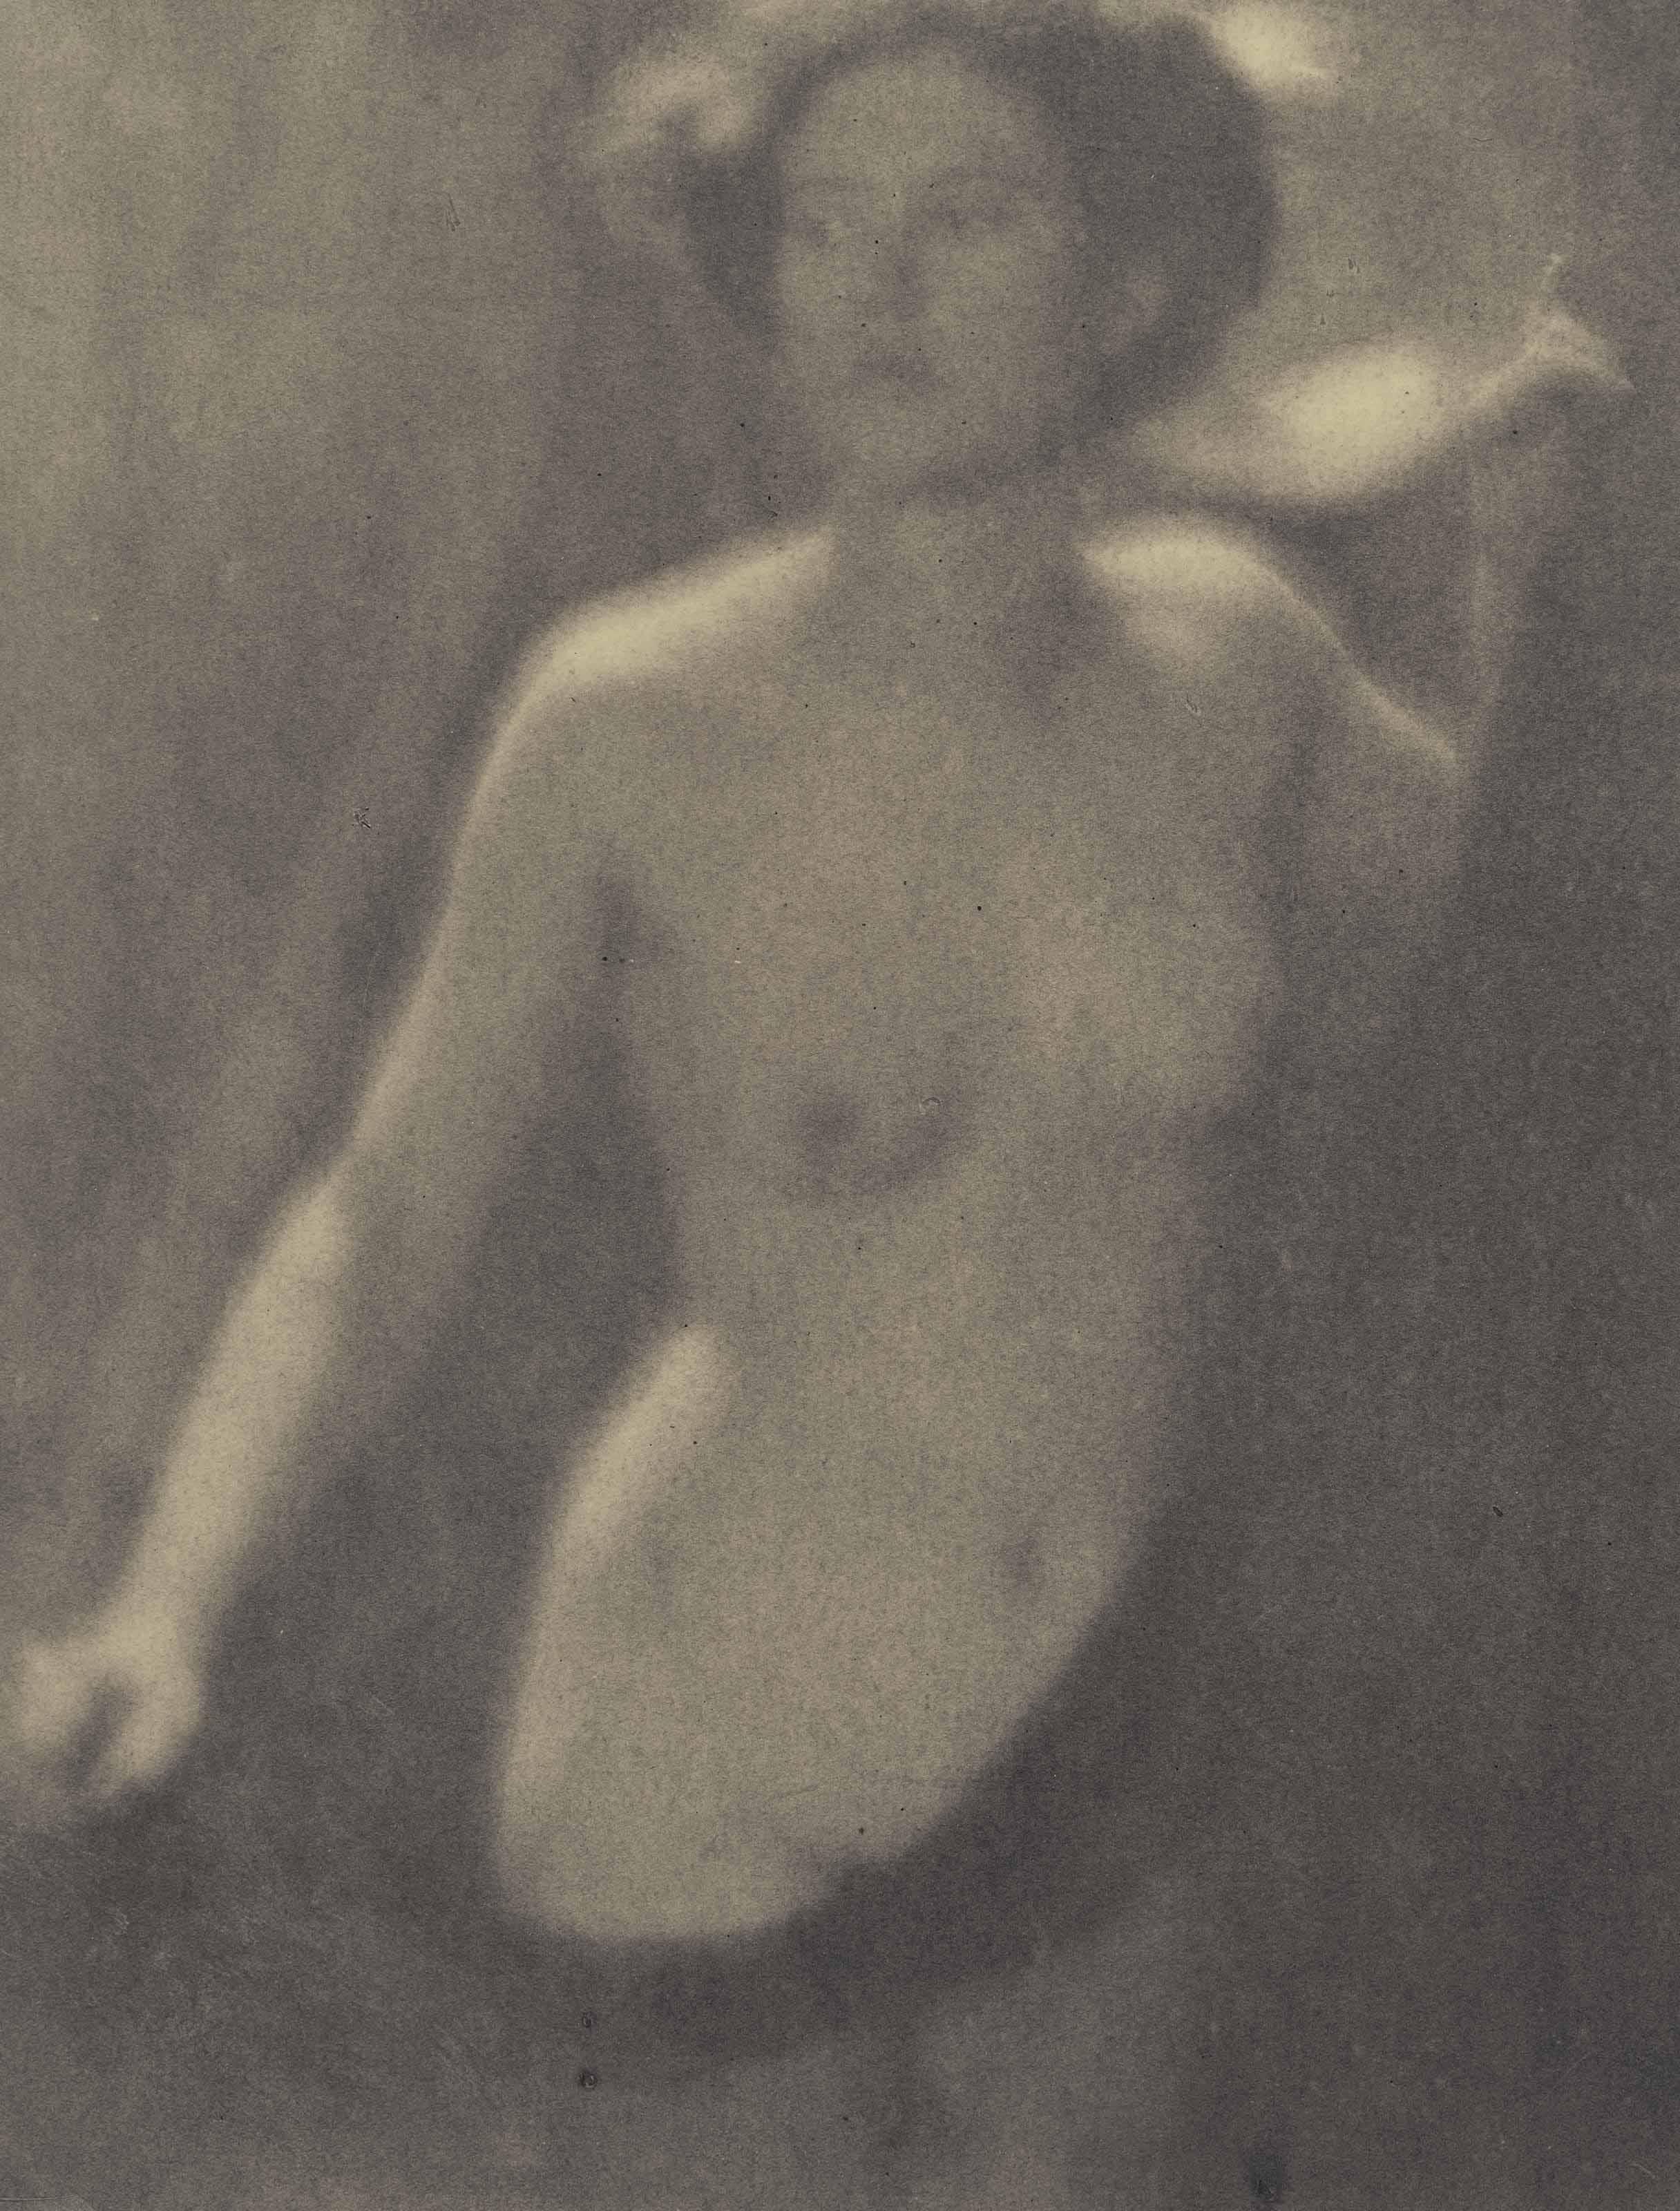 Nude Study, Miss Mabel Cramer, 1907